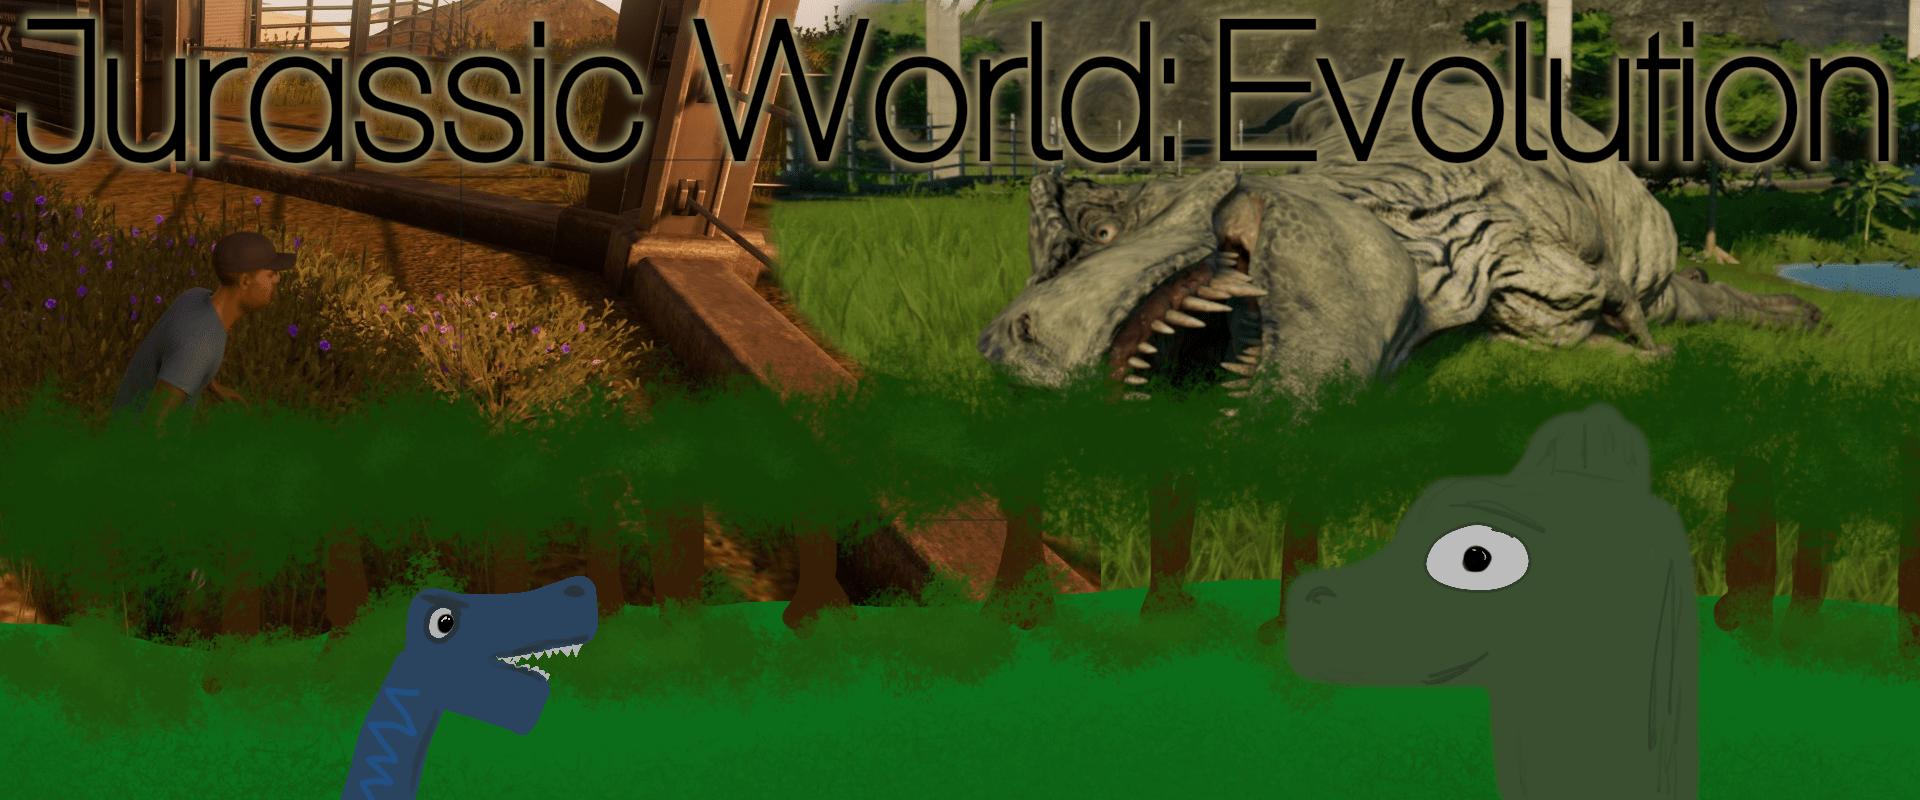 Jurassic World: Evolution 1